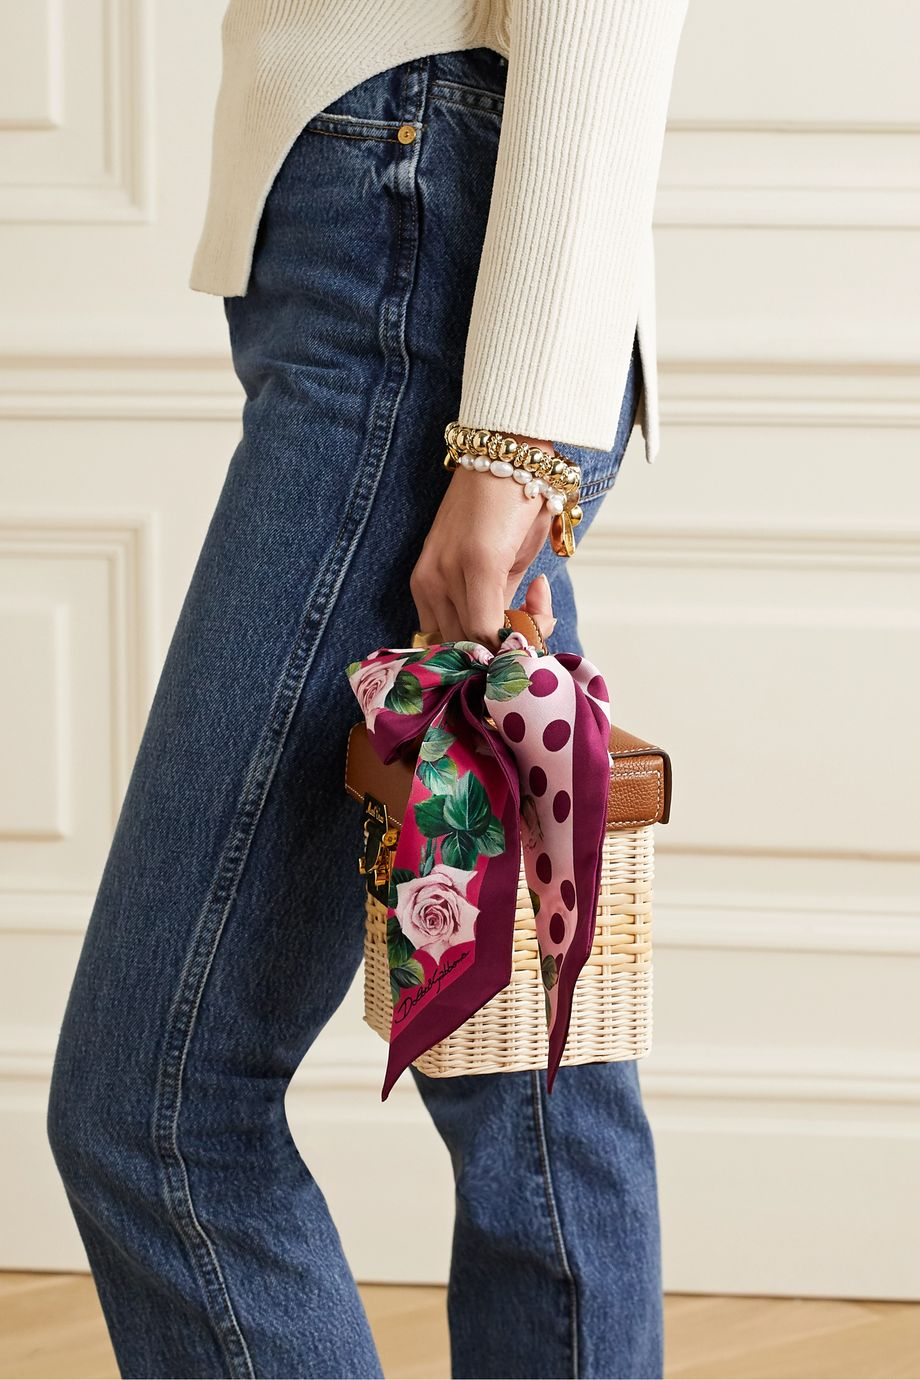 Dolce & Gabbana Foulard en serge de soie à imprimé fleuri